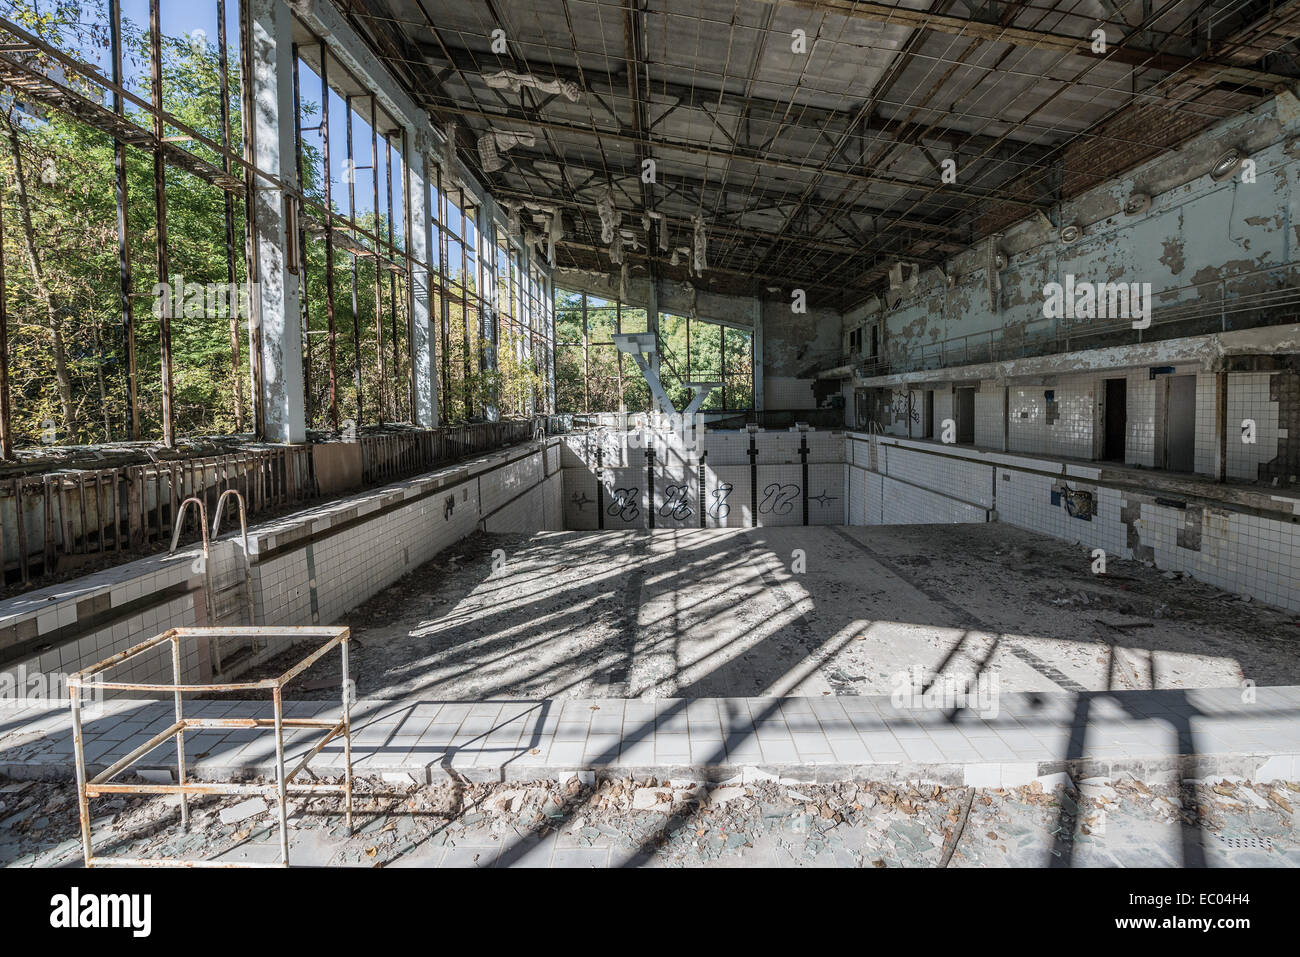 stock photo inside the lazurnyj or lazurny eng azure swimming pool in pripyat abandoned city chernobyl exclusion zone ukraine - Inside Swimming Pool